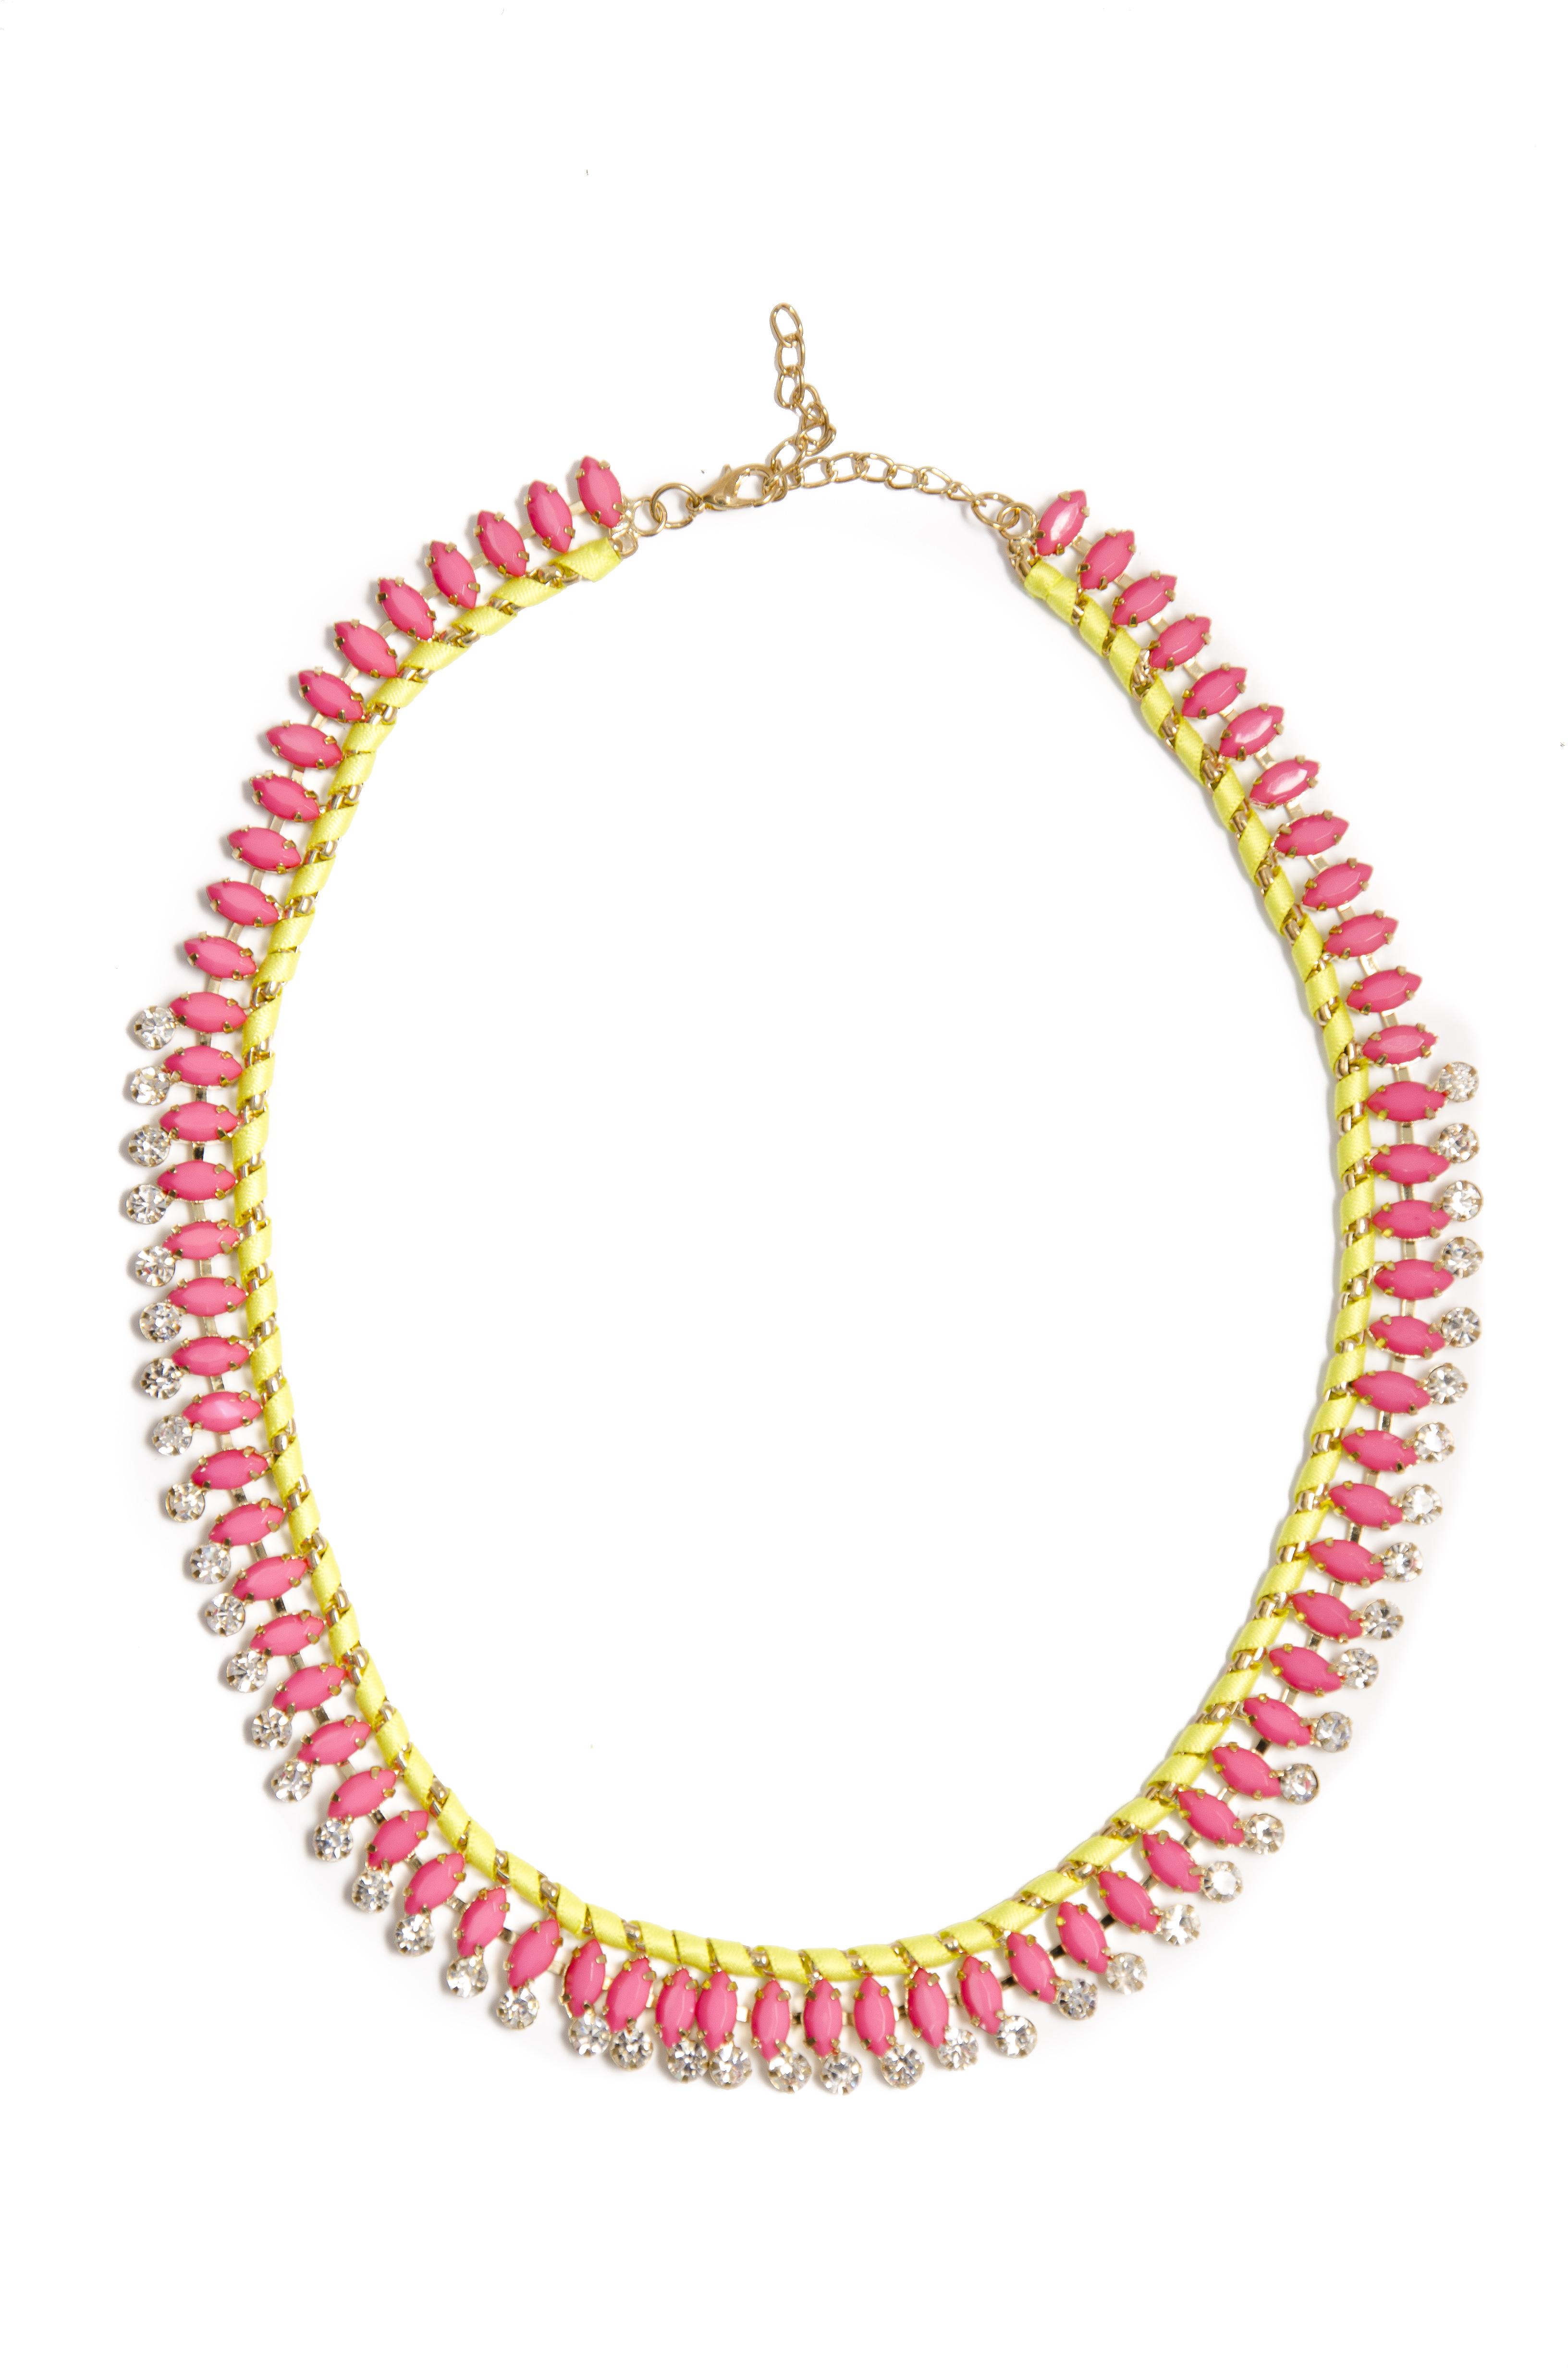 Deluxebuys - Collar Dolores Iguacel $89